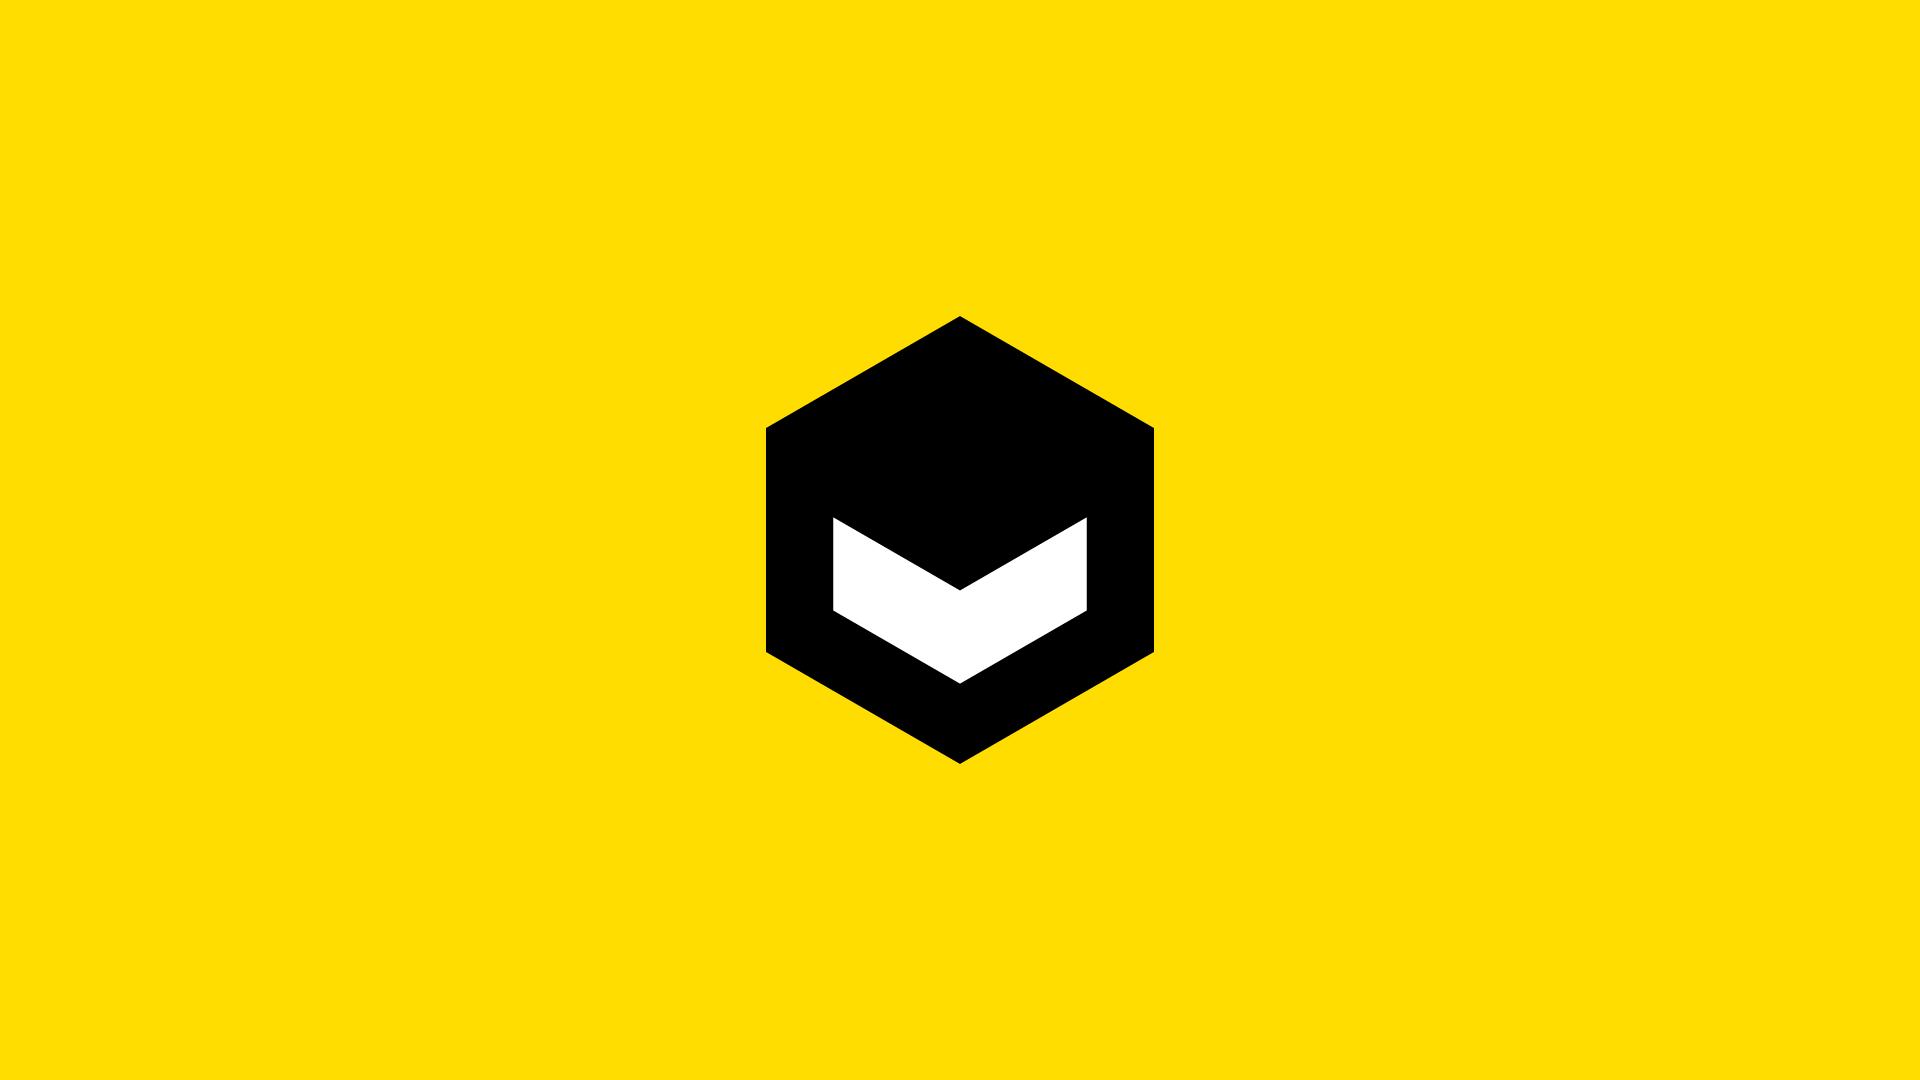 vrv_logos-01.png